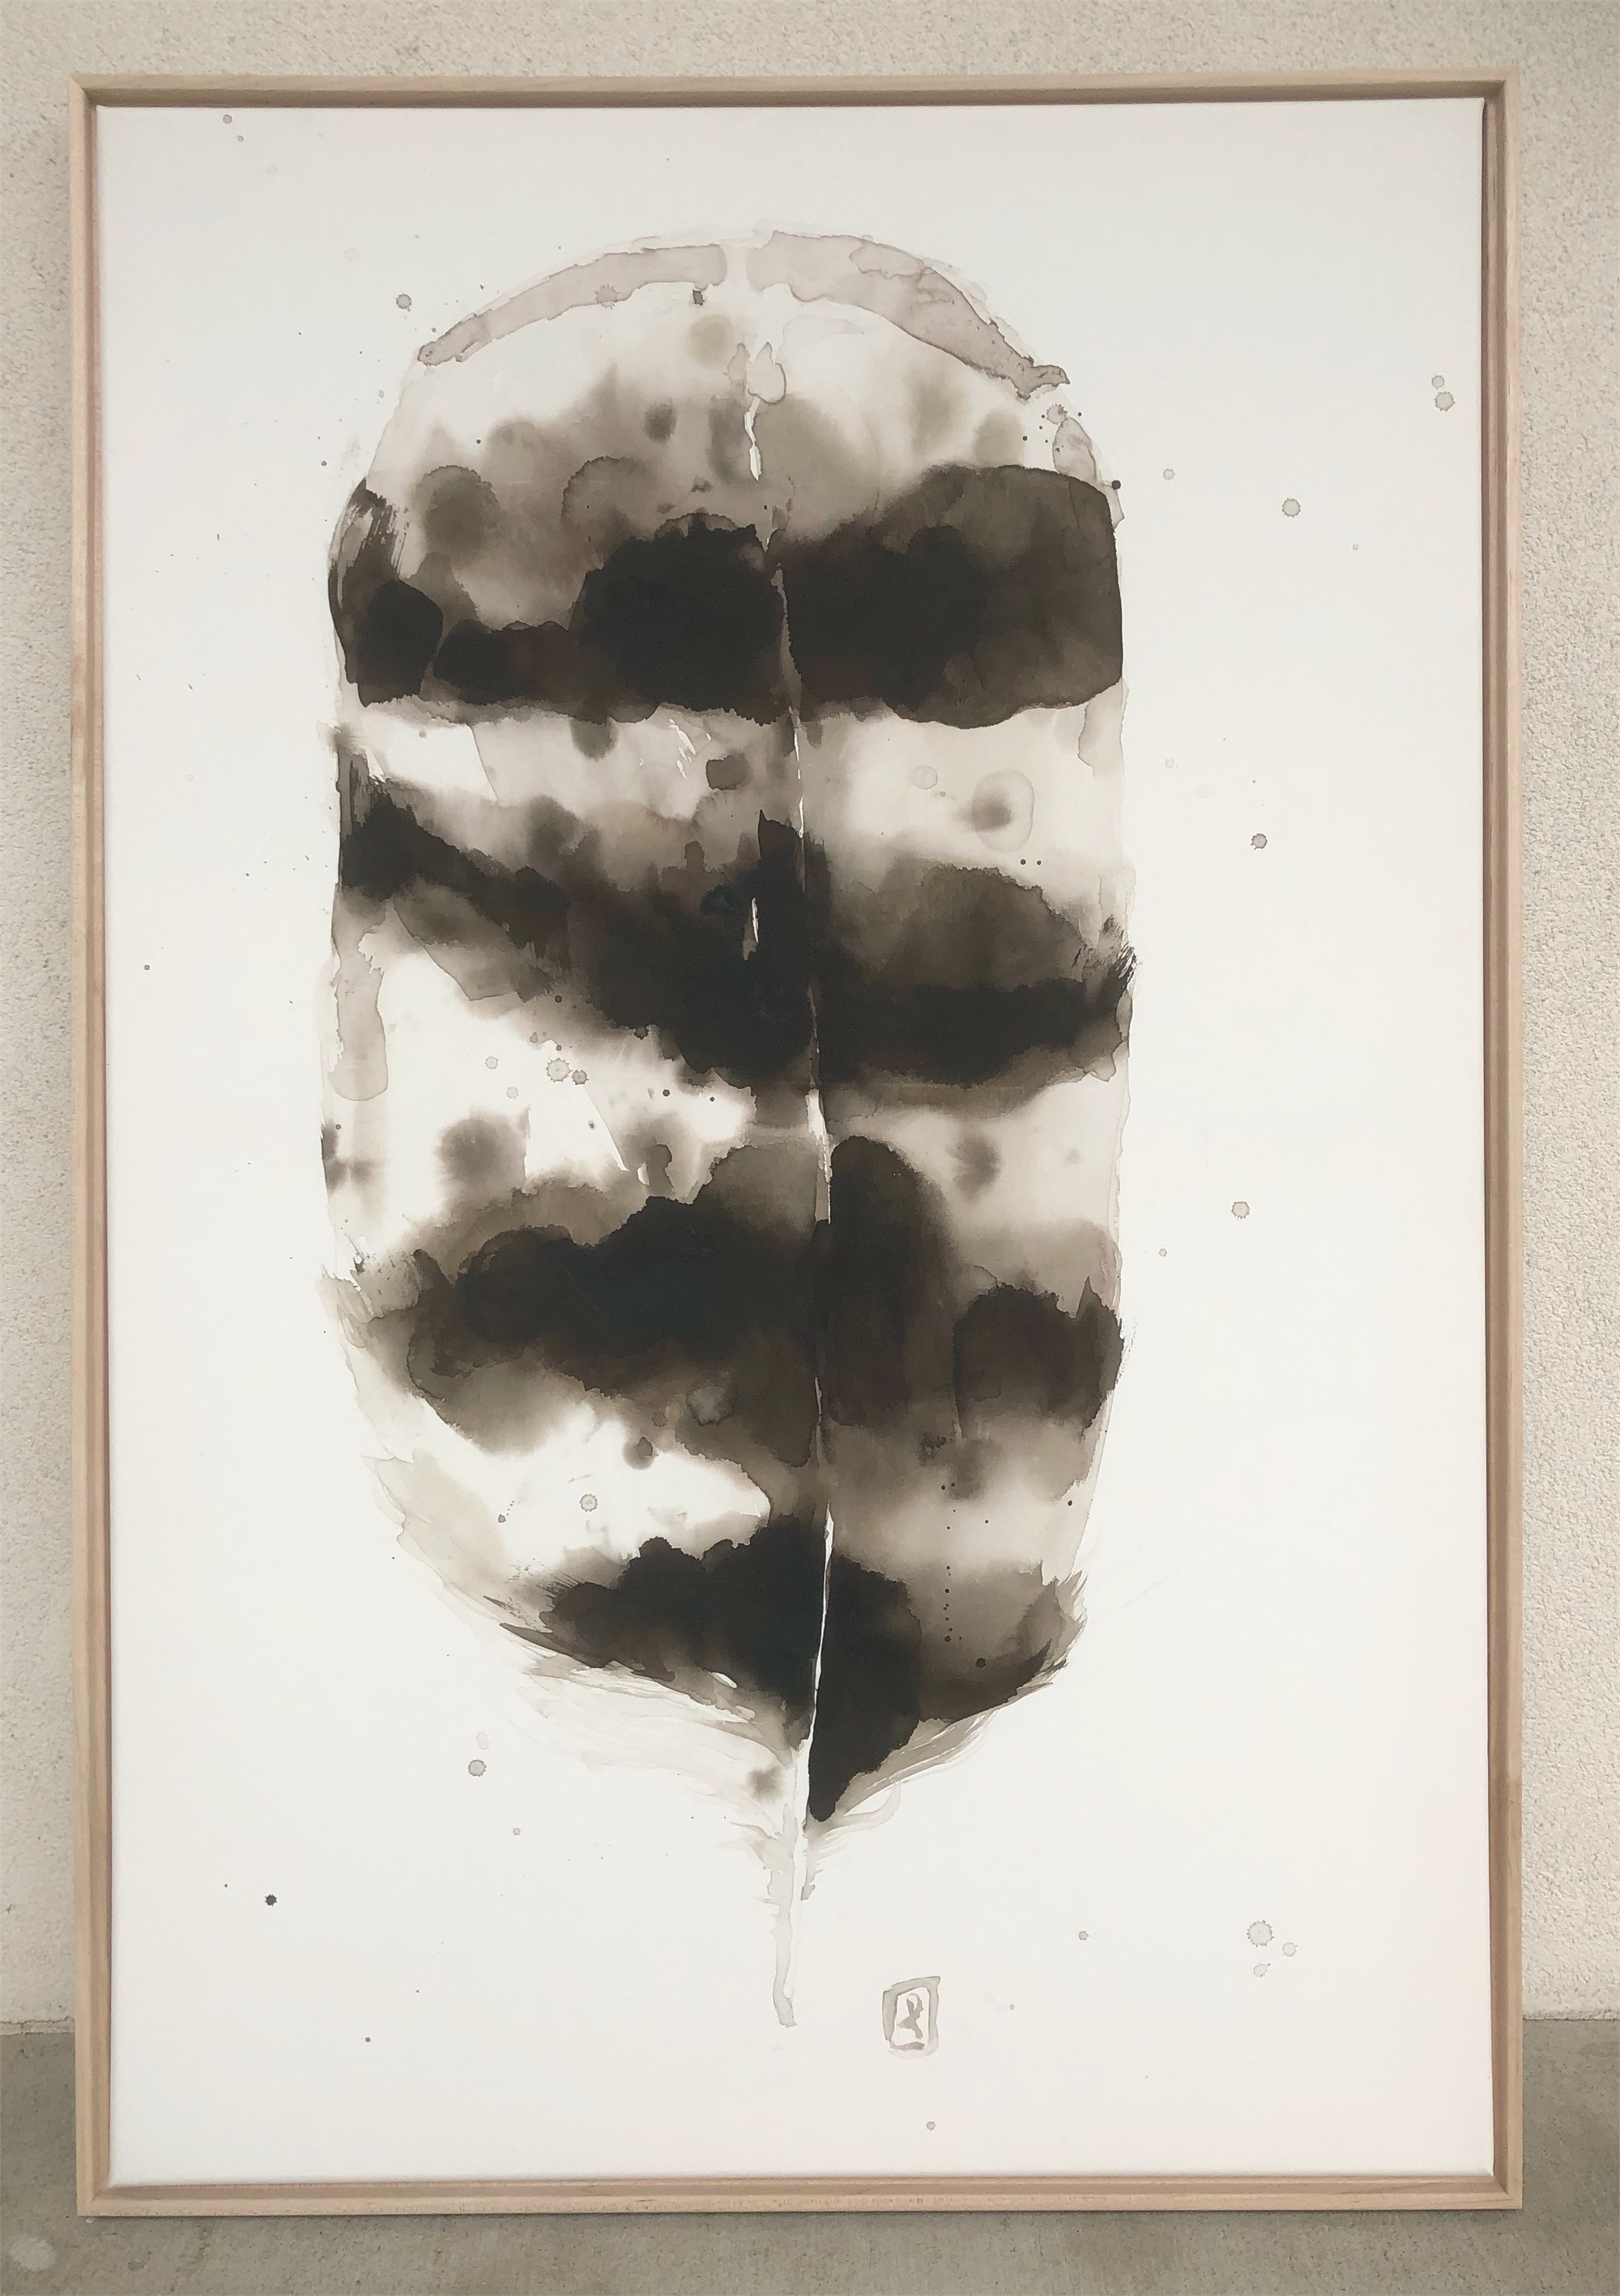 Pinion 8 by Laura Roebuck